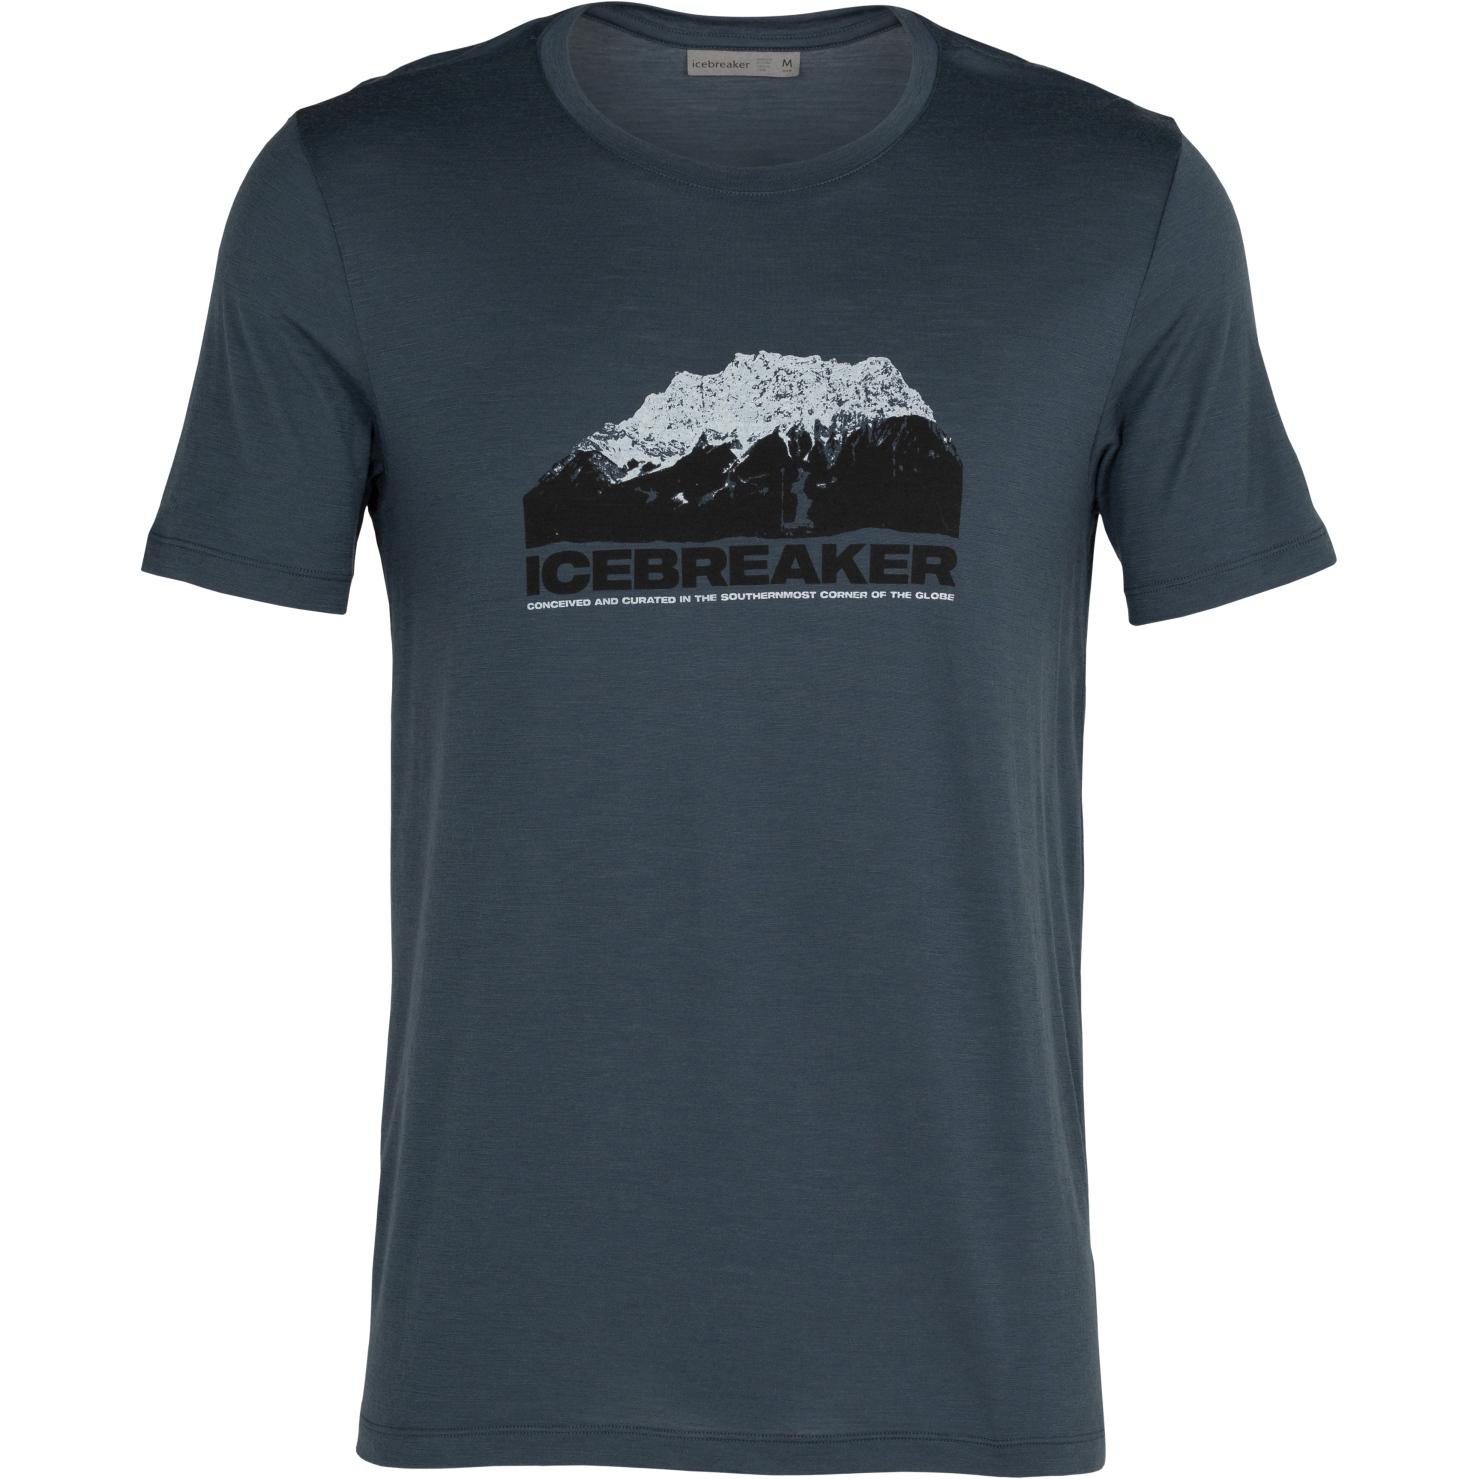 Produktbild von Icebreaker Tech Lite Crewe Icebreaker Mountain Herren T-Shirt - Serene Blue